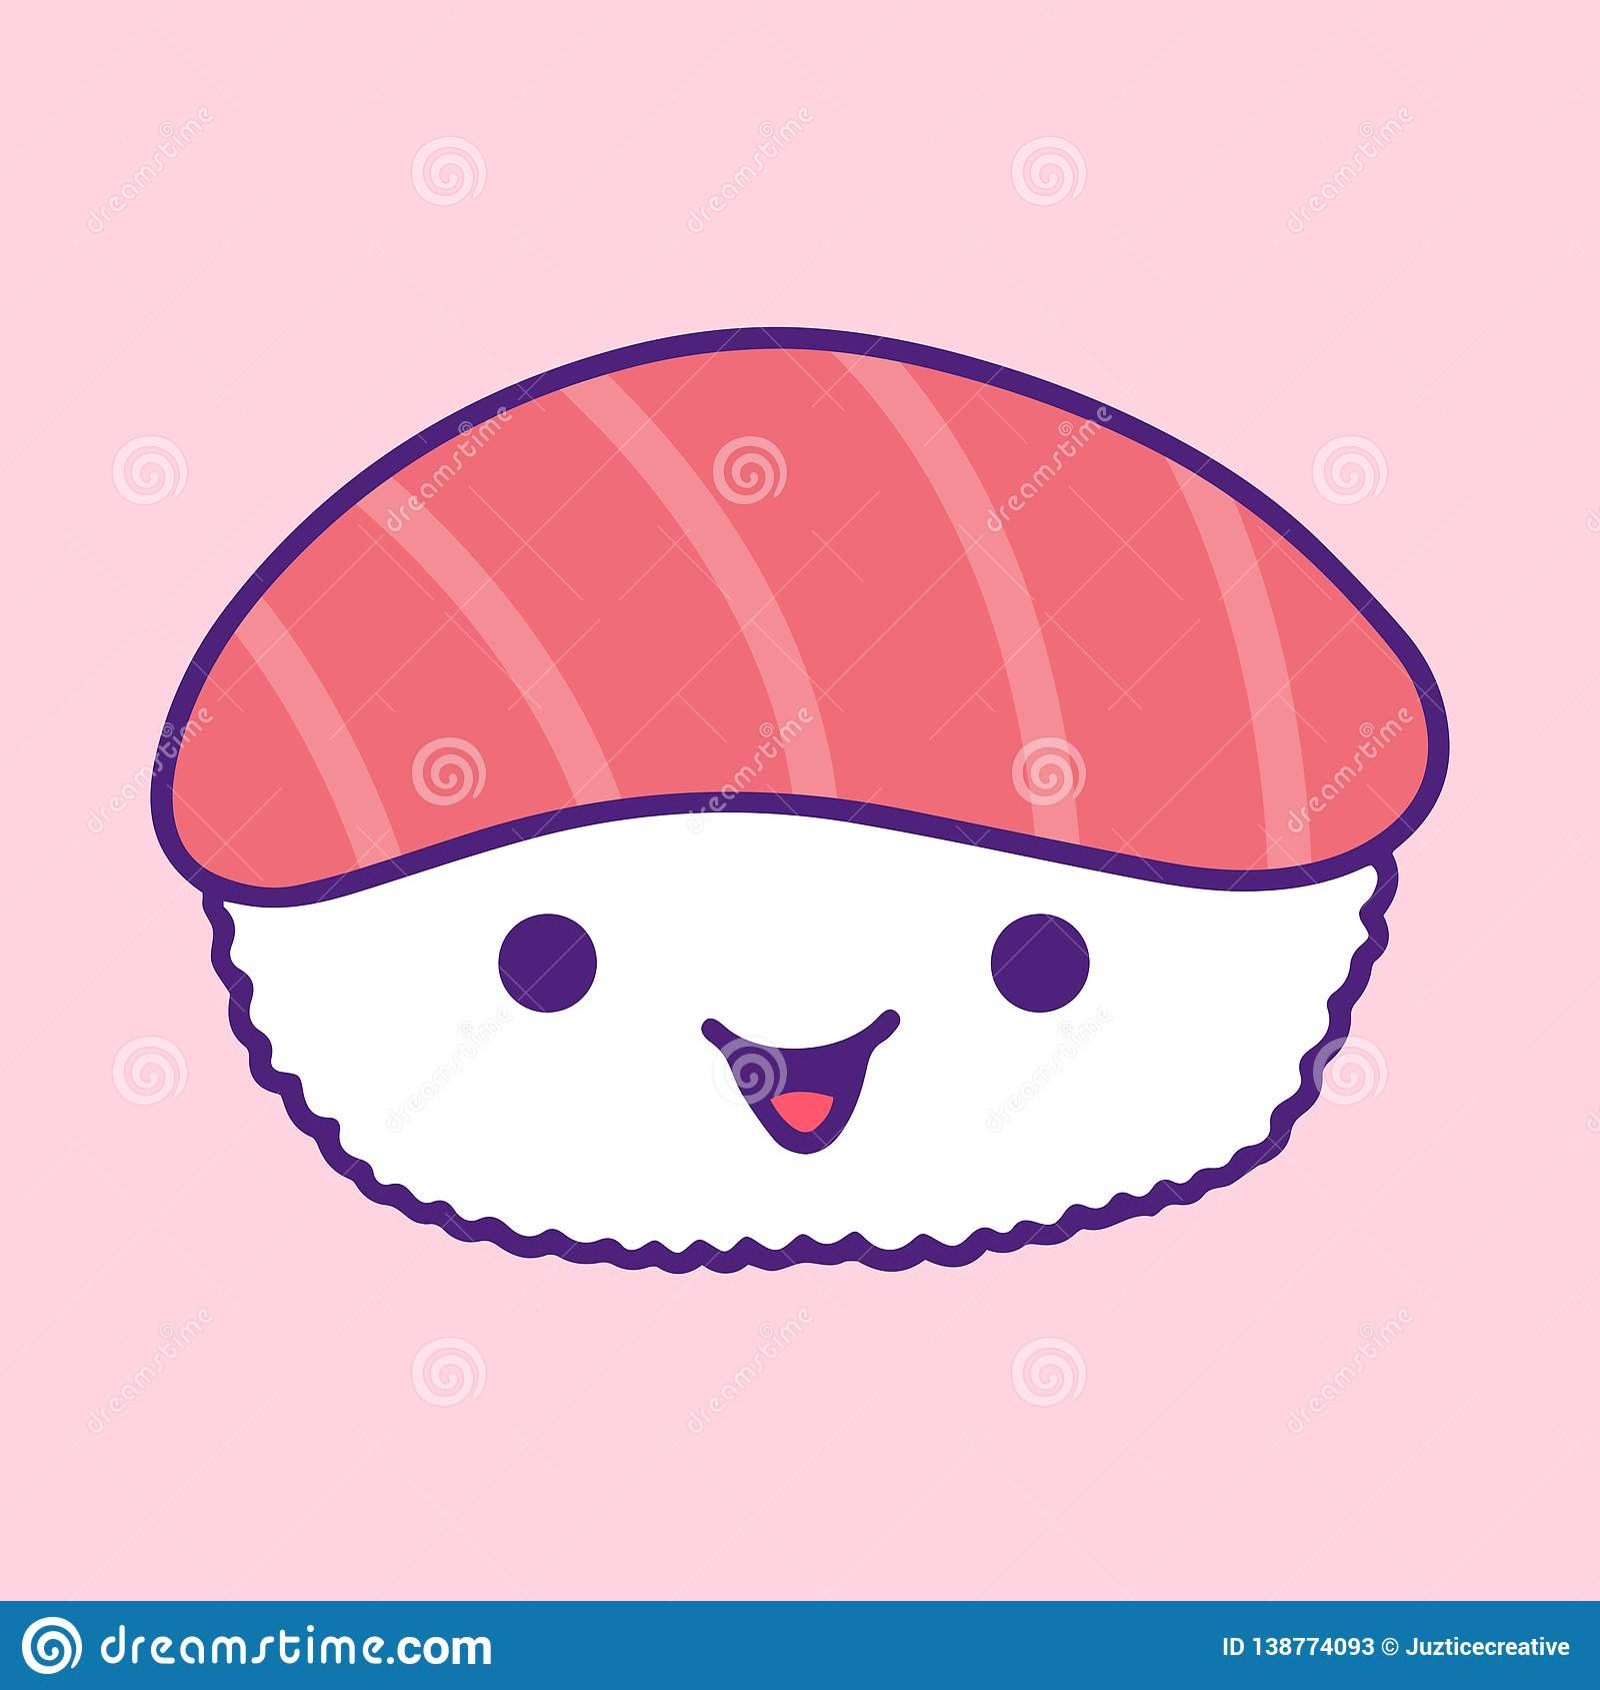 Cute Kawaii Illustration Of Salmon Sushi Smiling Stock